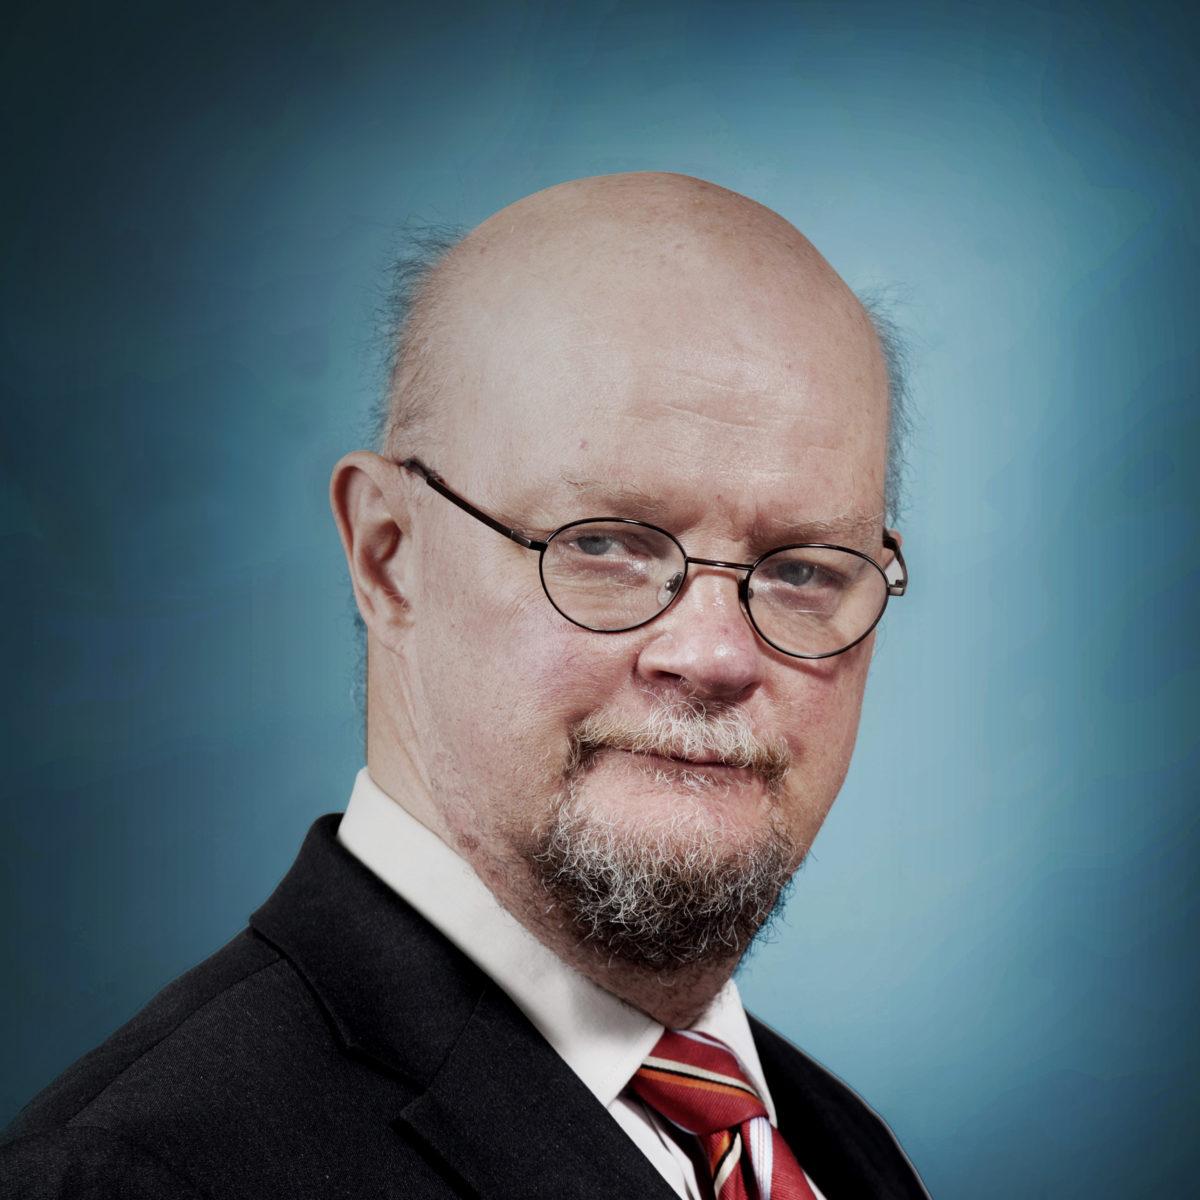 Osmo Soininvaara